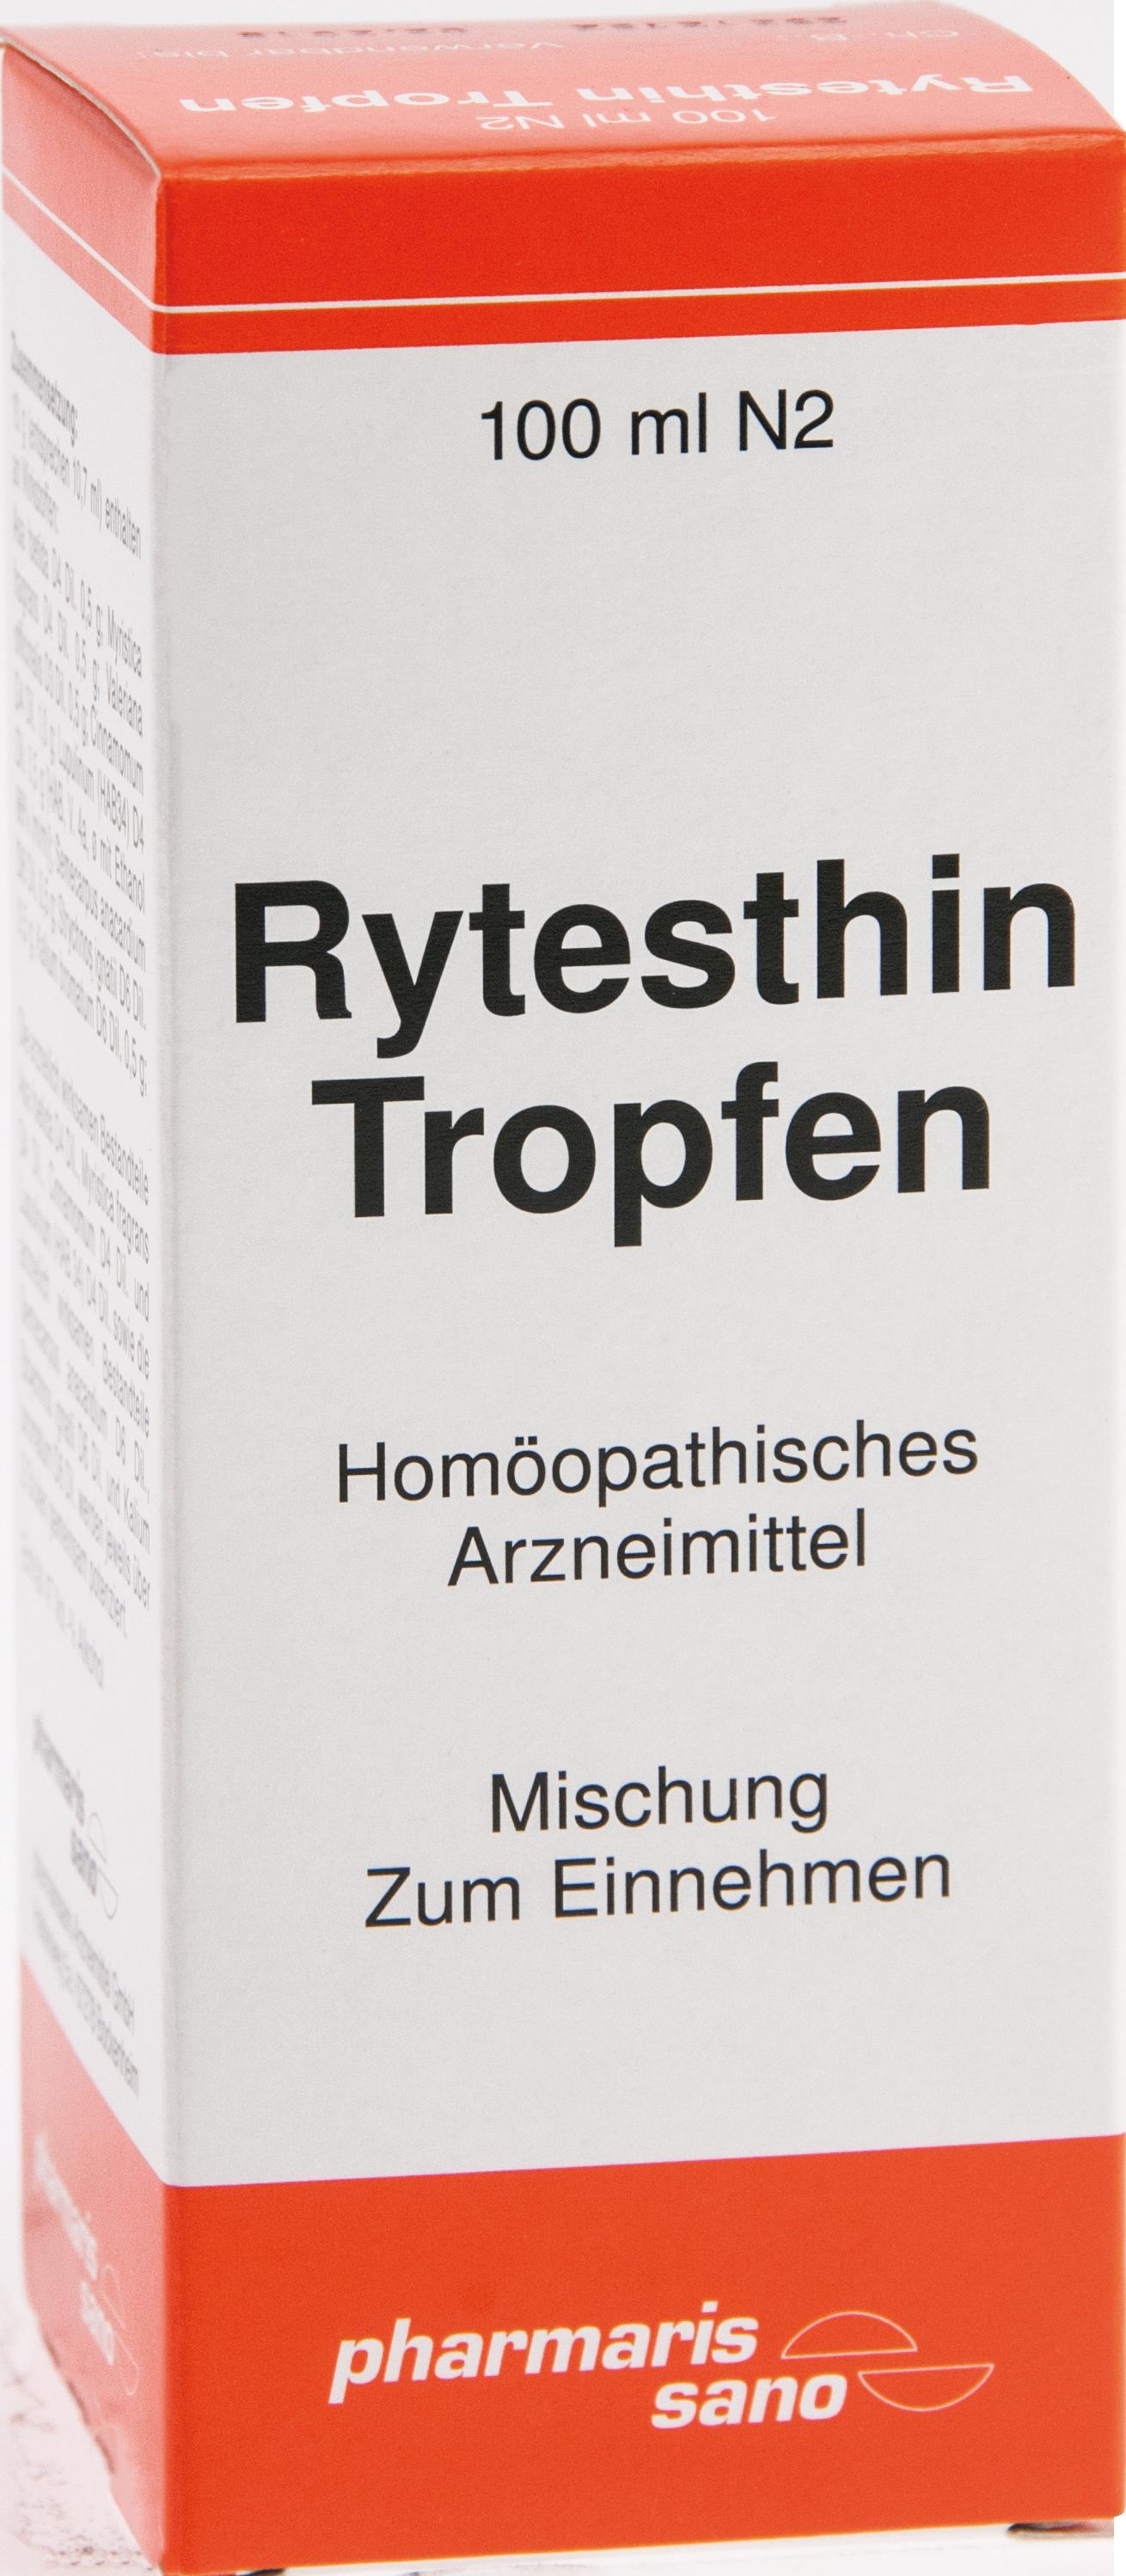 Rytesthin-Tropfen Röwo-576